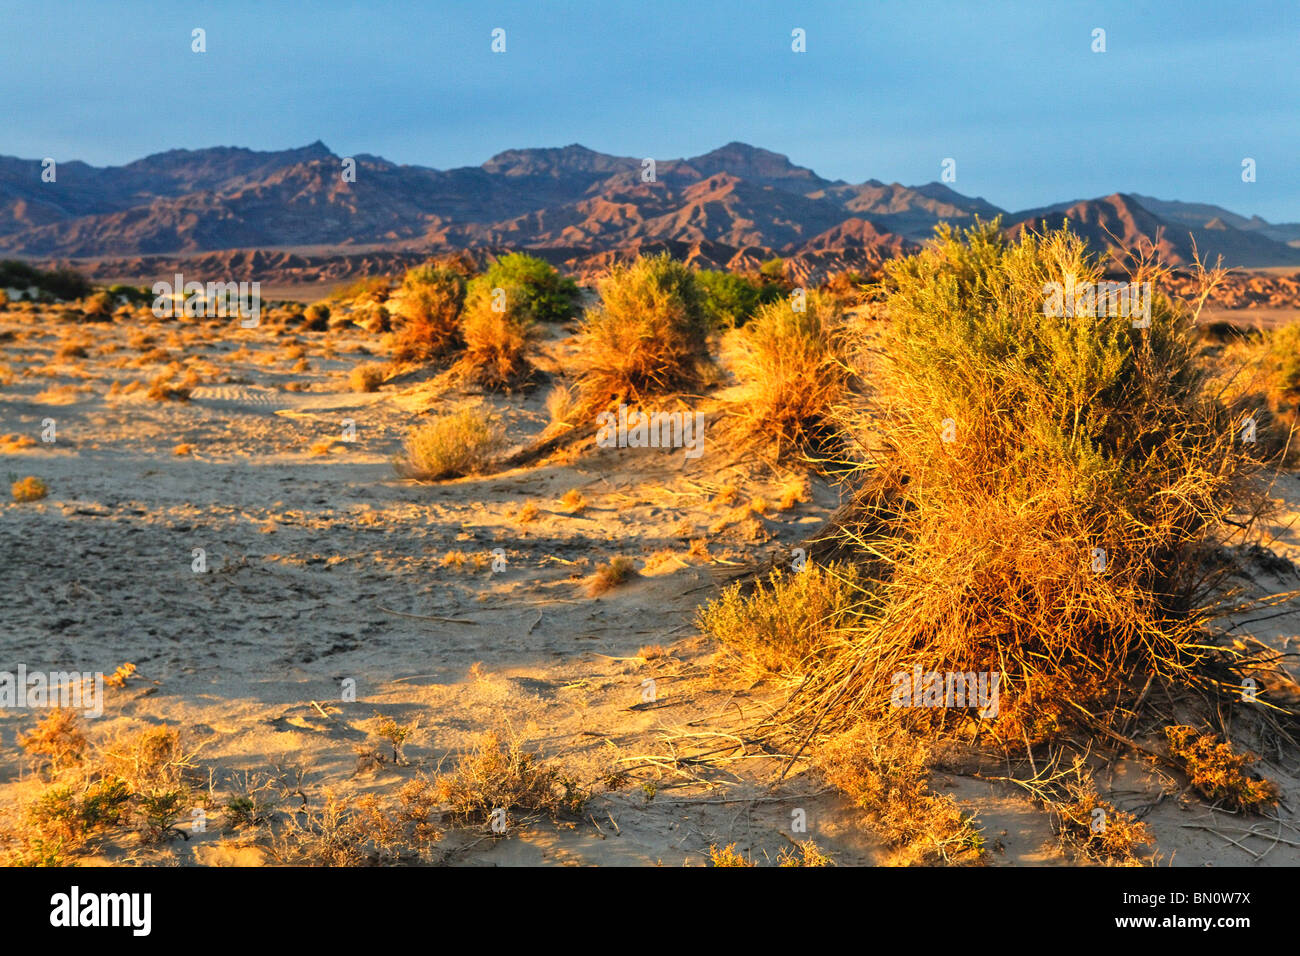 Sonnenuntergang am des Teufels Cornfield, Death Valley Nationalpark, Kalifornien Stockbild